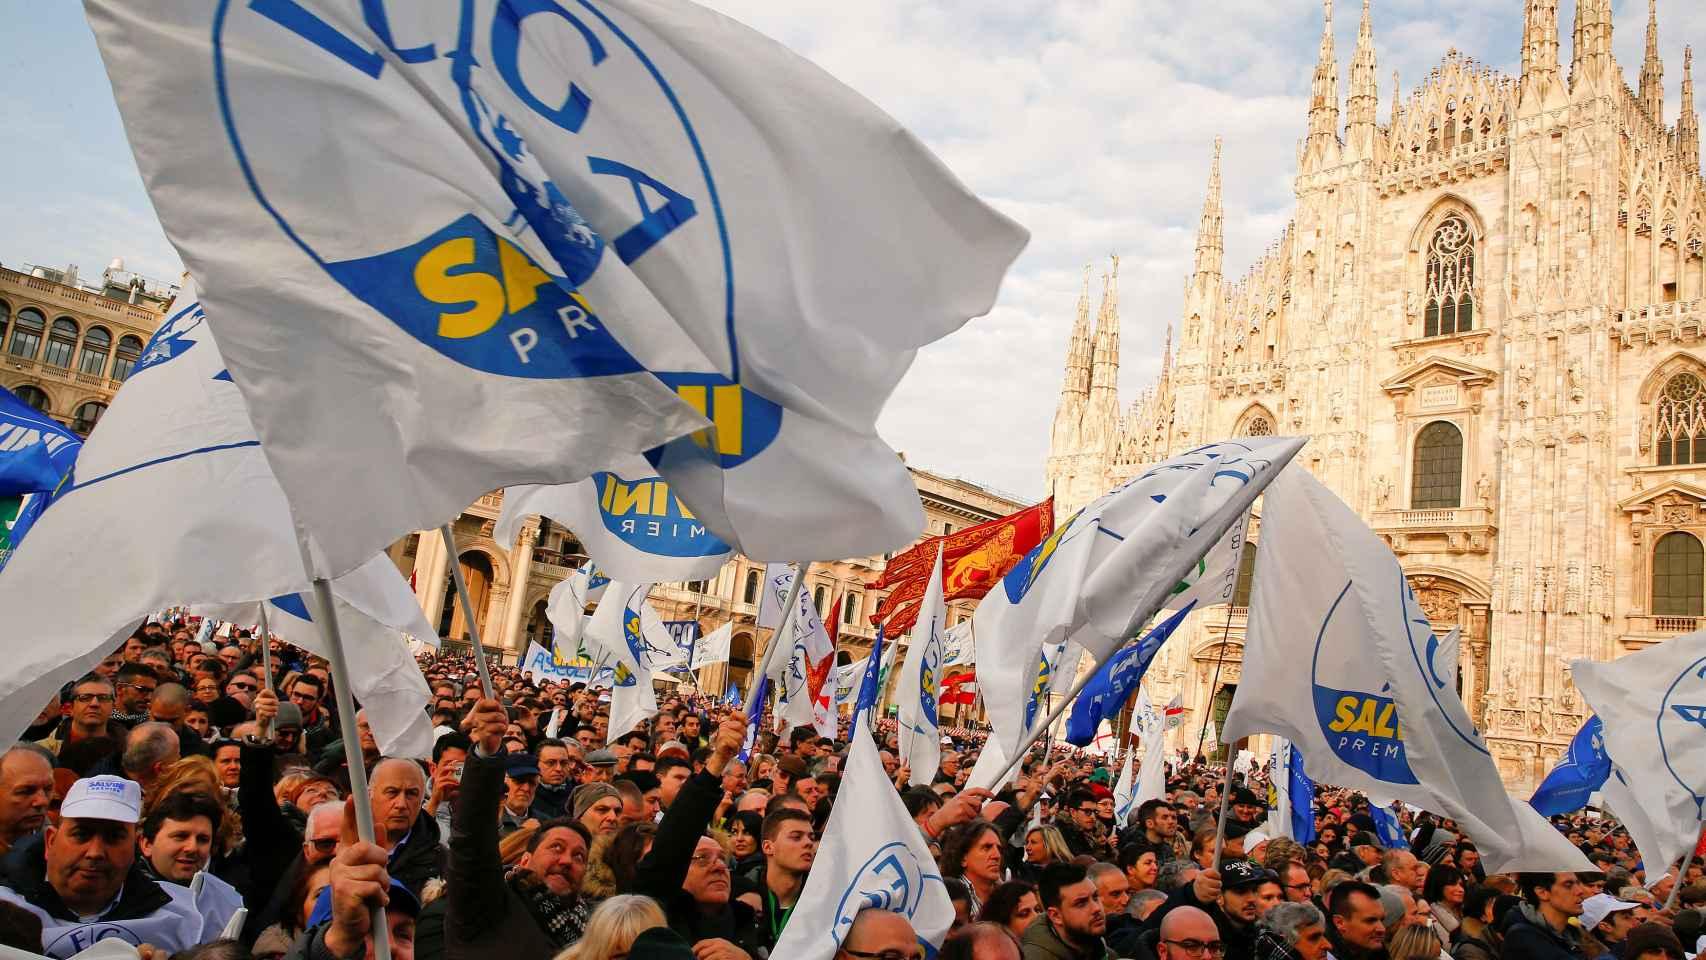 Seguidores de la Liga Norte, en un mitin de Matteo Salvini en Milán.